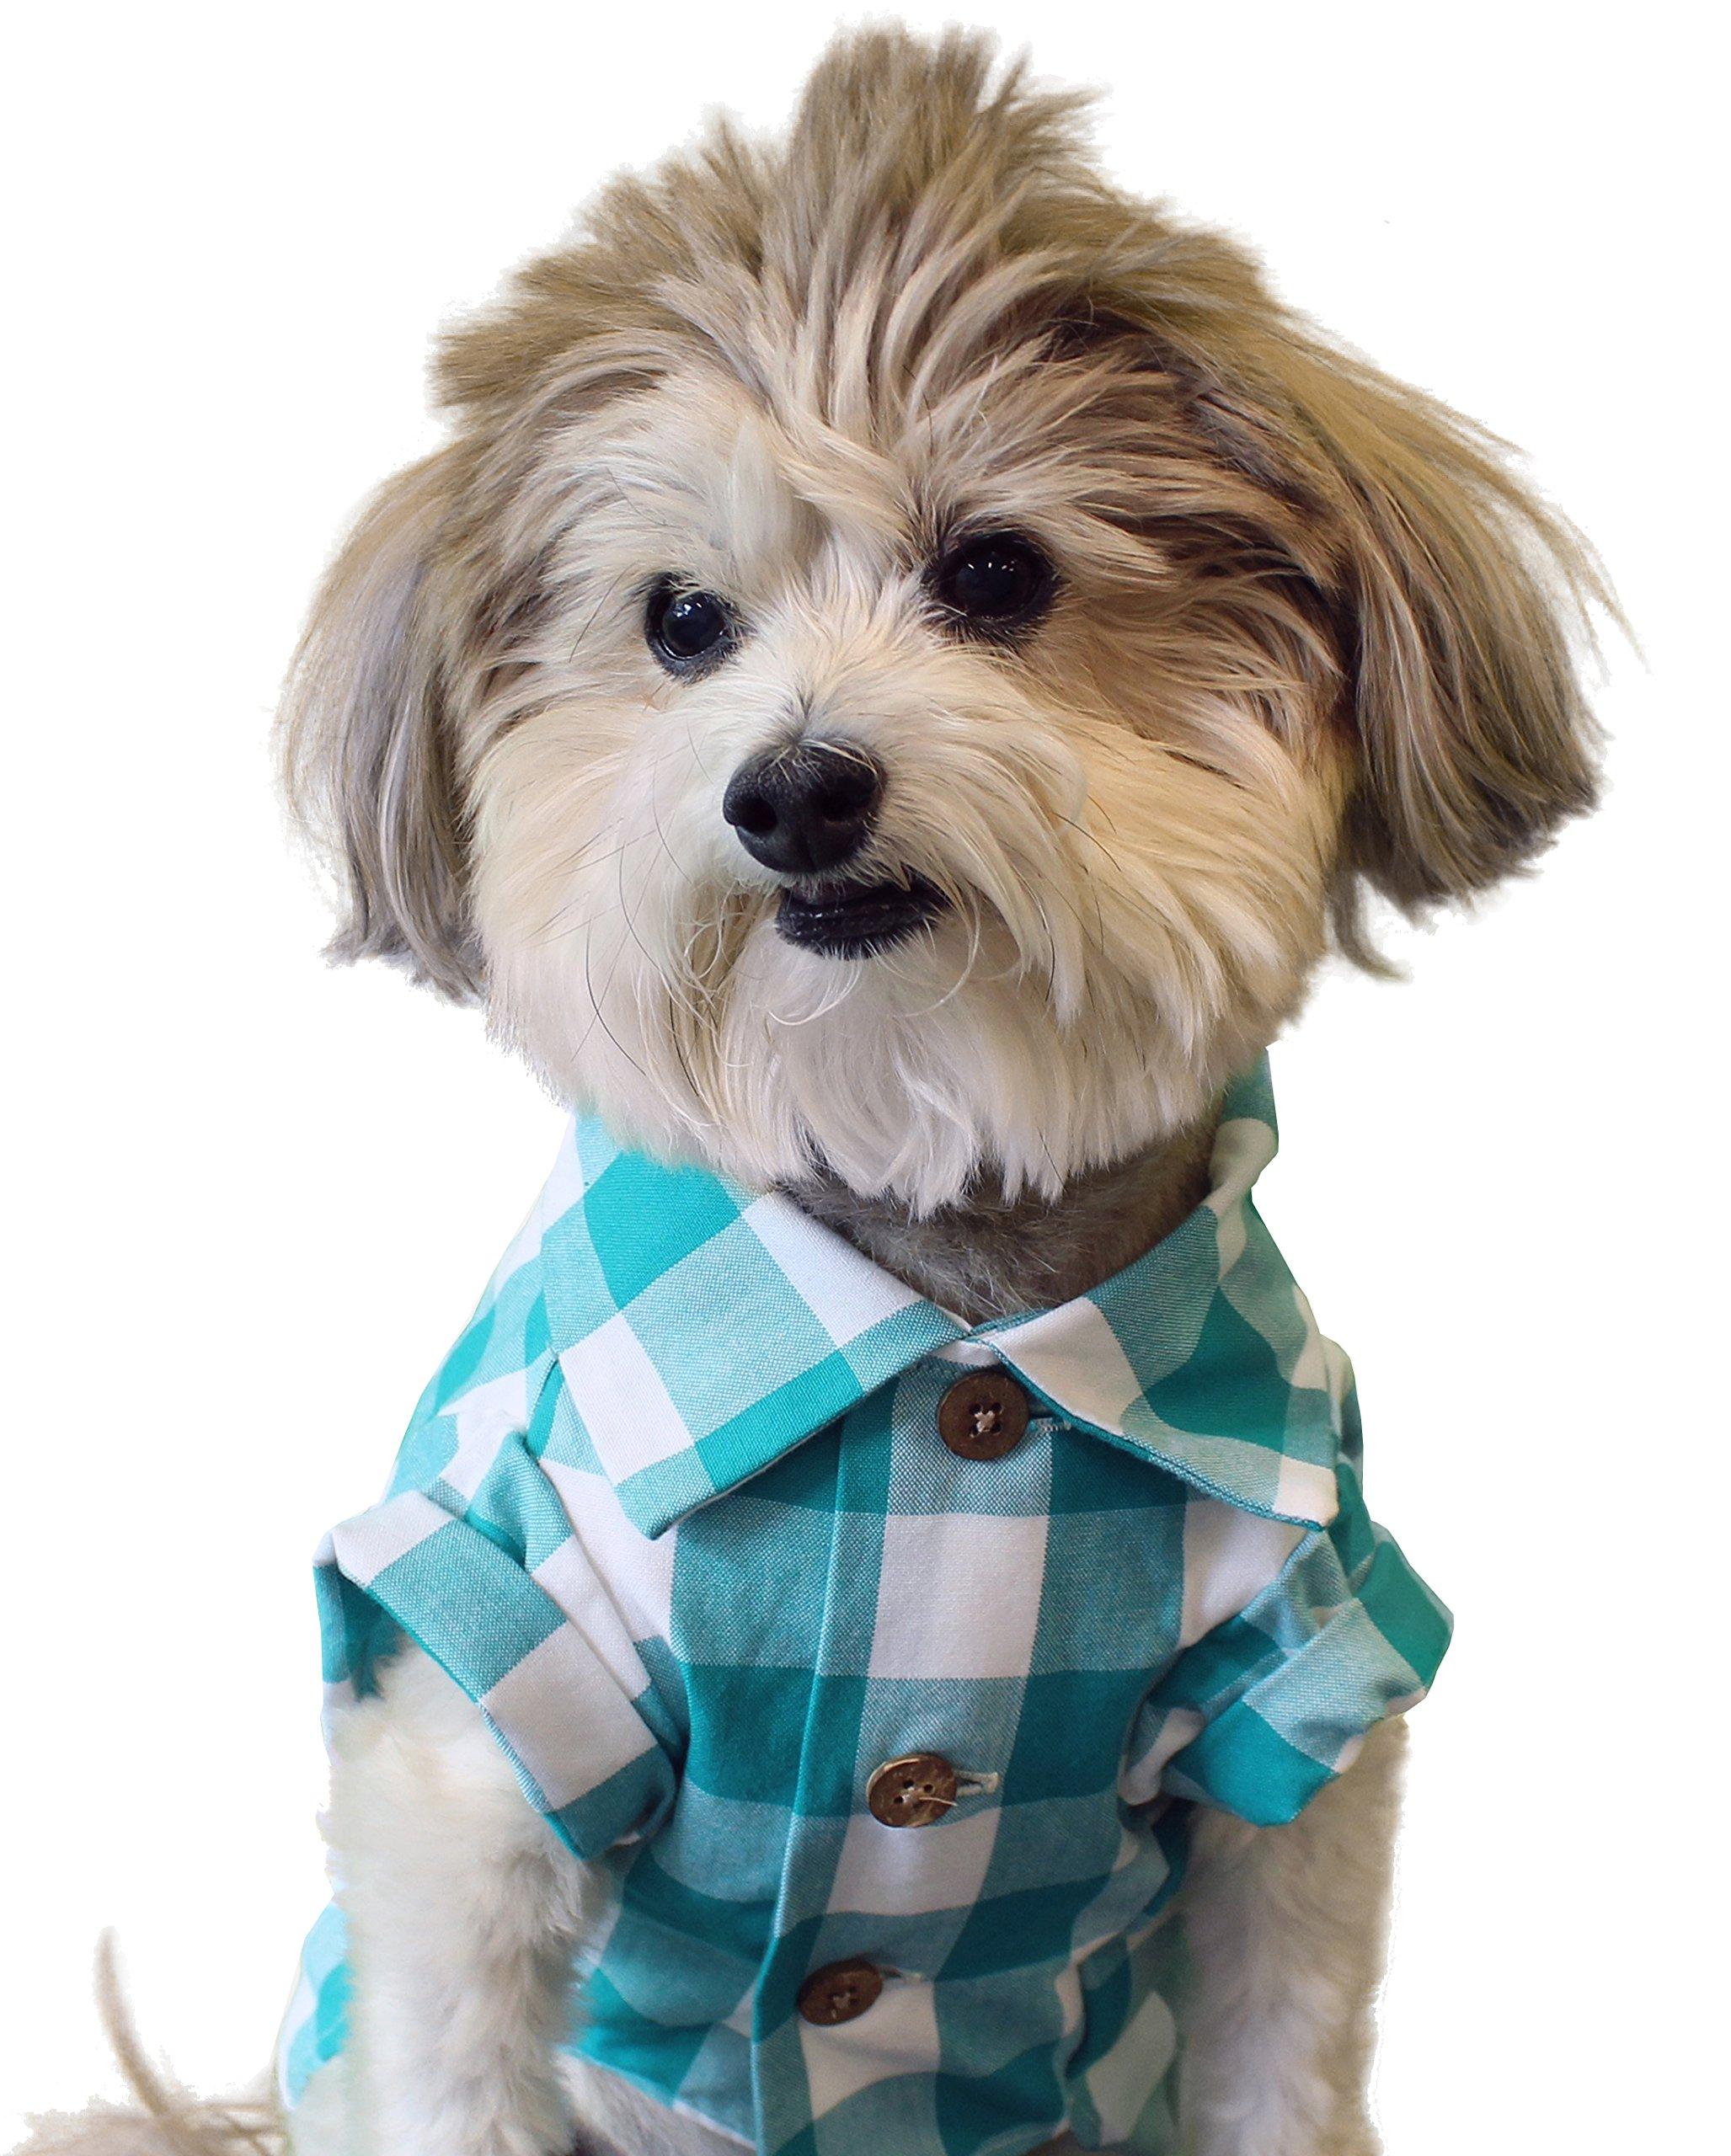 Dog Threads™ Plaid Dog Shirt by Picnic Plaid Shirt Check Plaid Button-Up Dog Shirt Teal (M (20-28lbs))